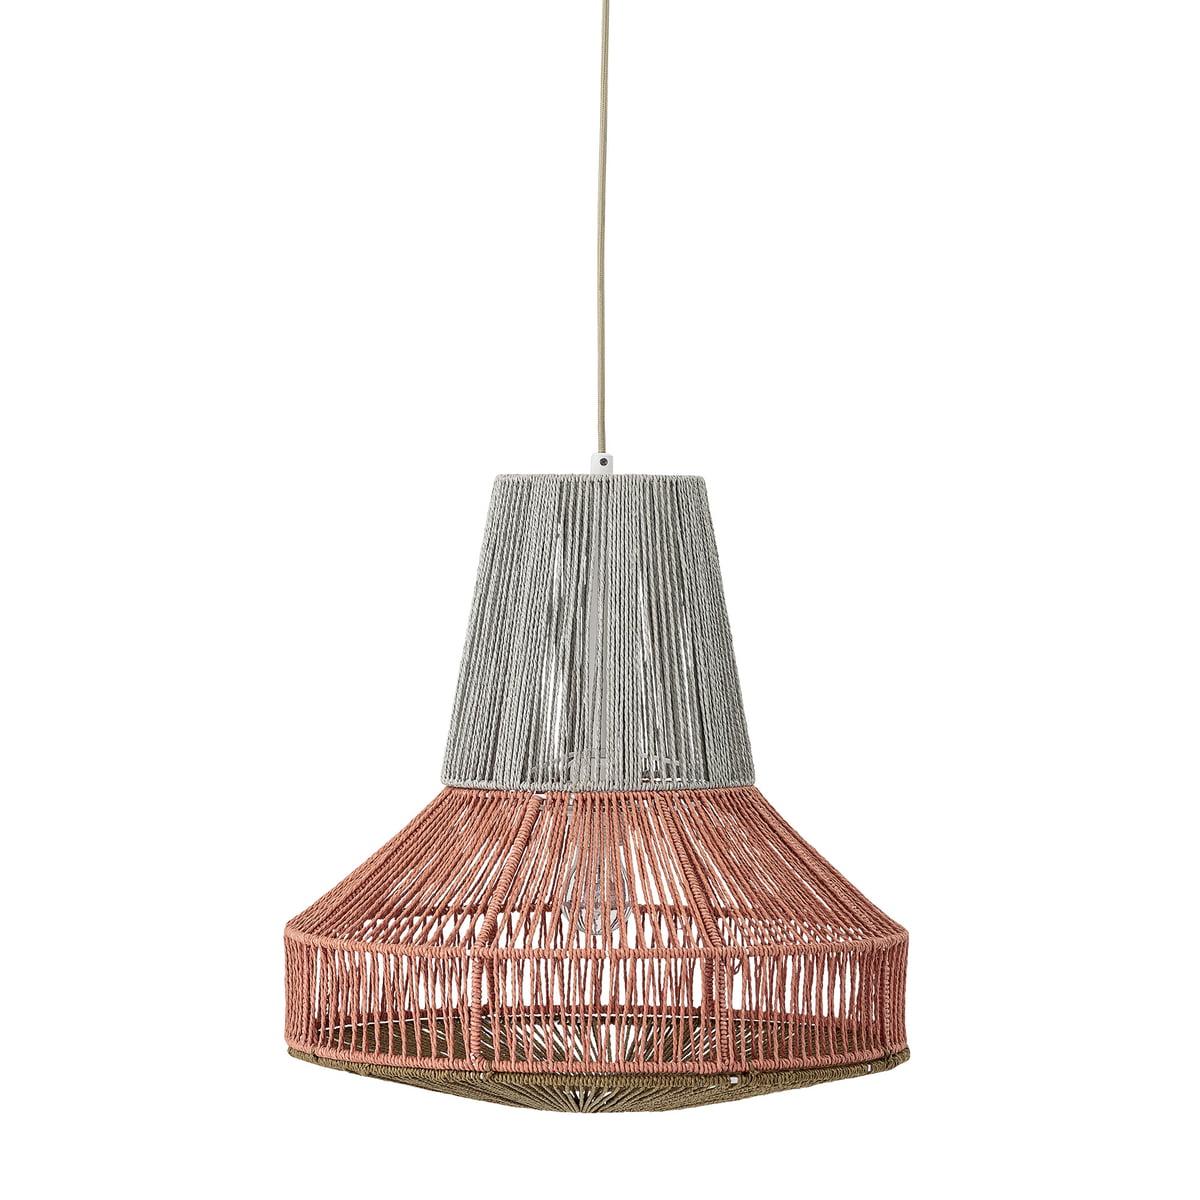 Bloomingville - Pendelleuchte aus Baumwolle, Ø 45 x H 45 cm, grau / rot